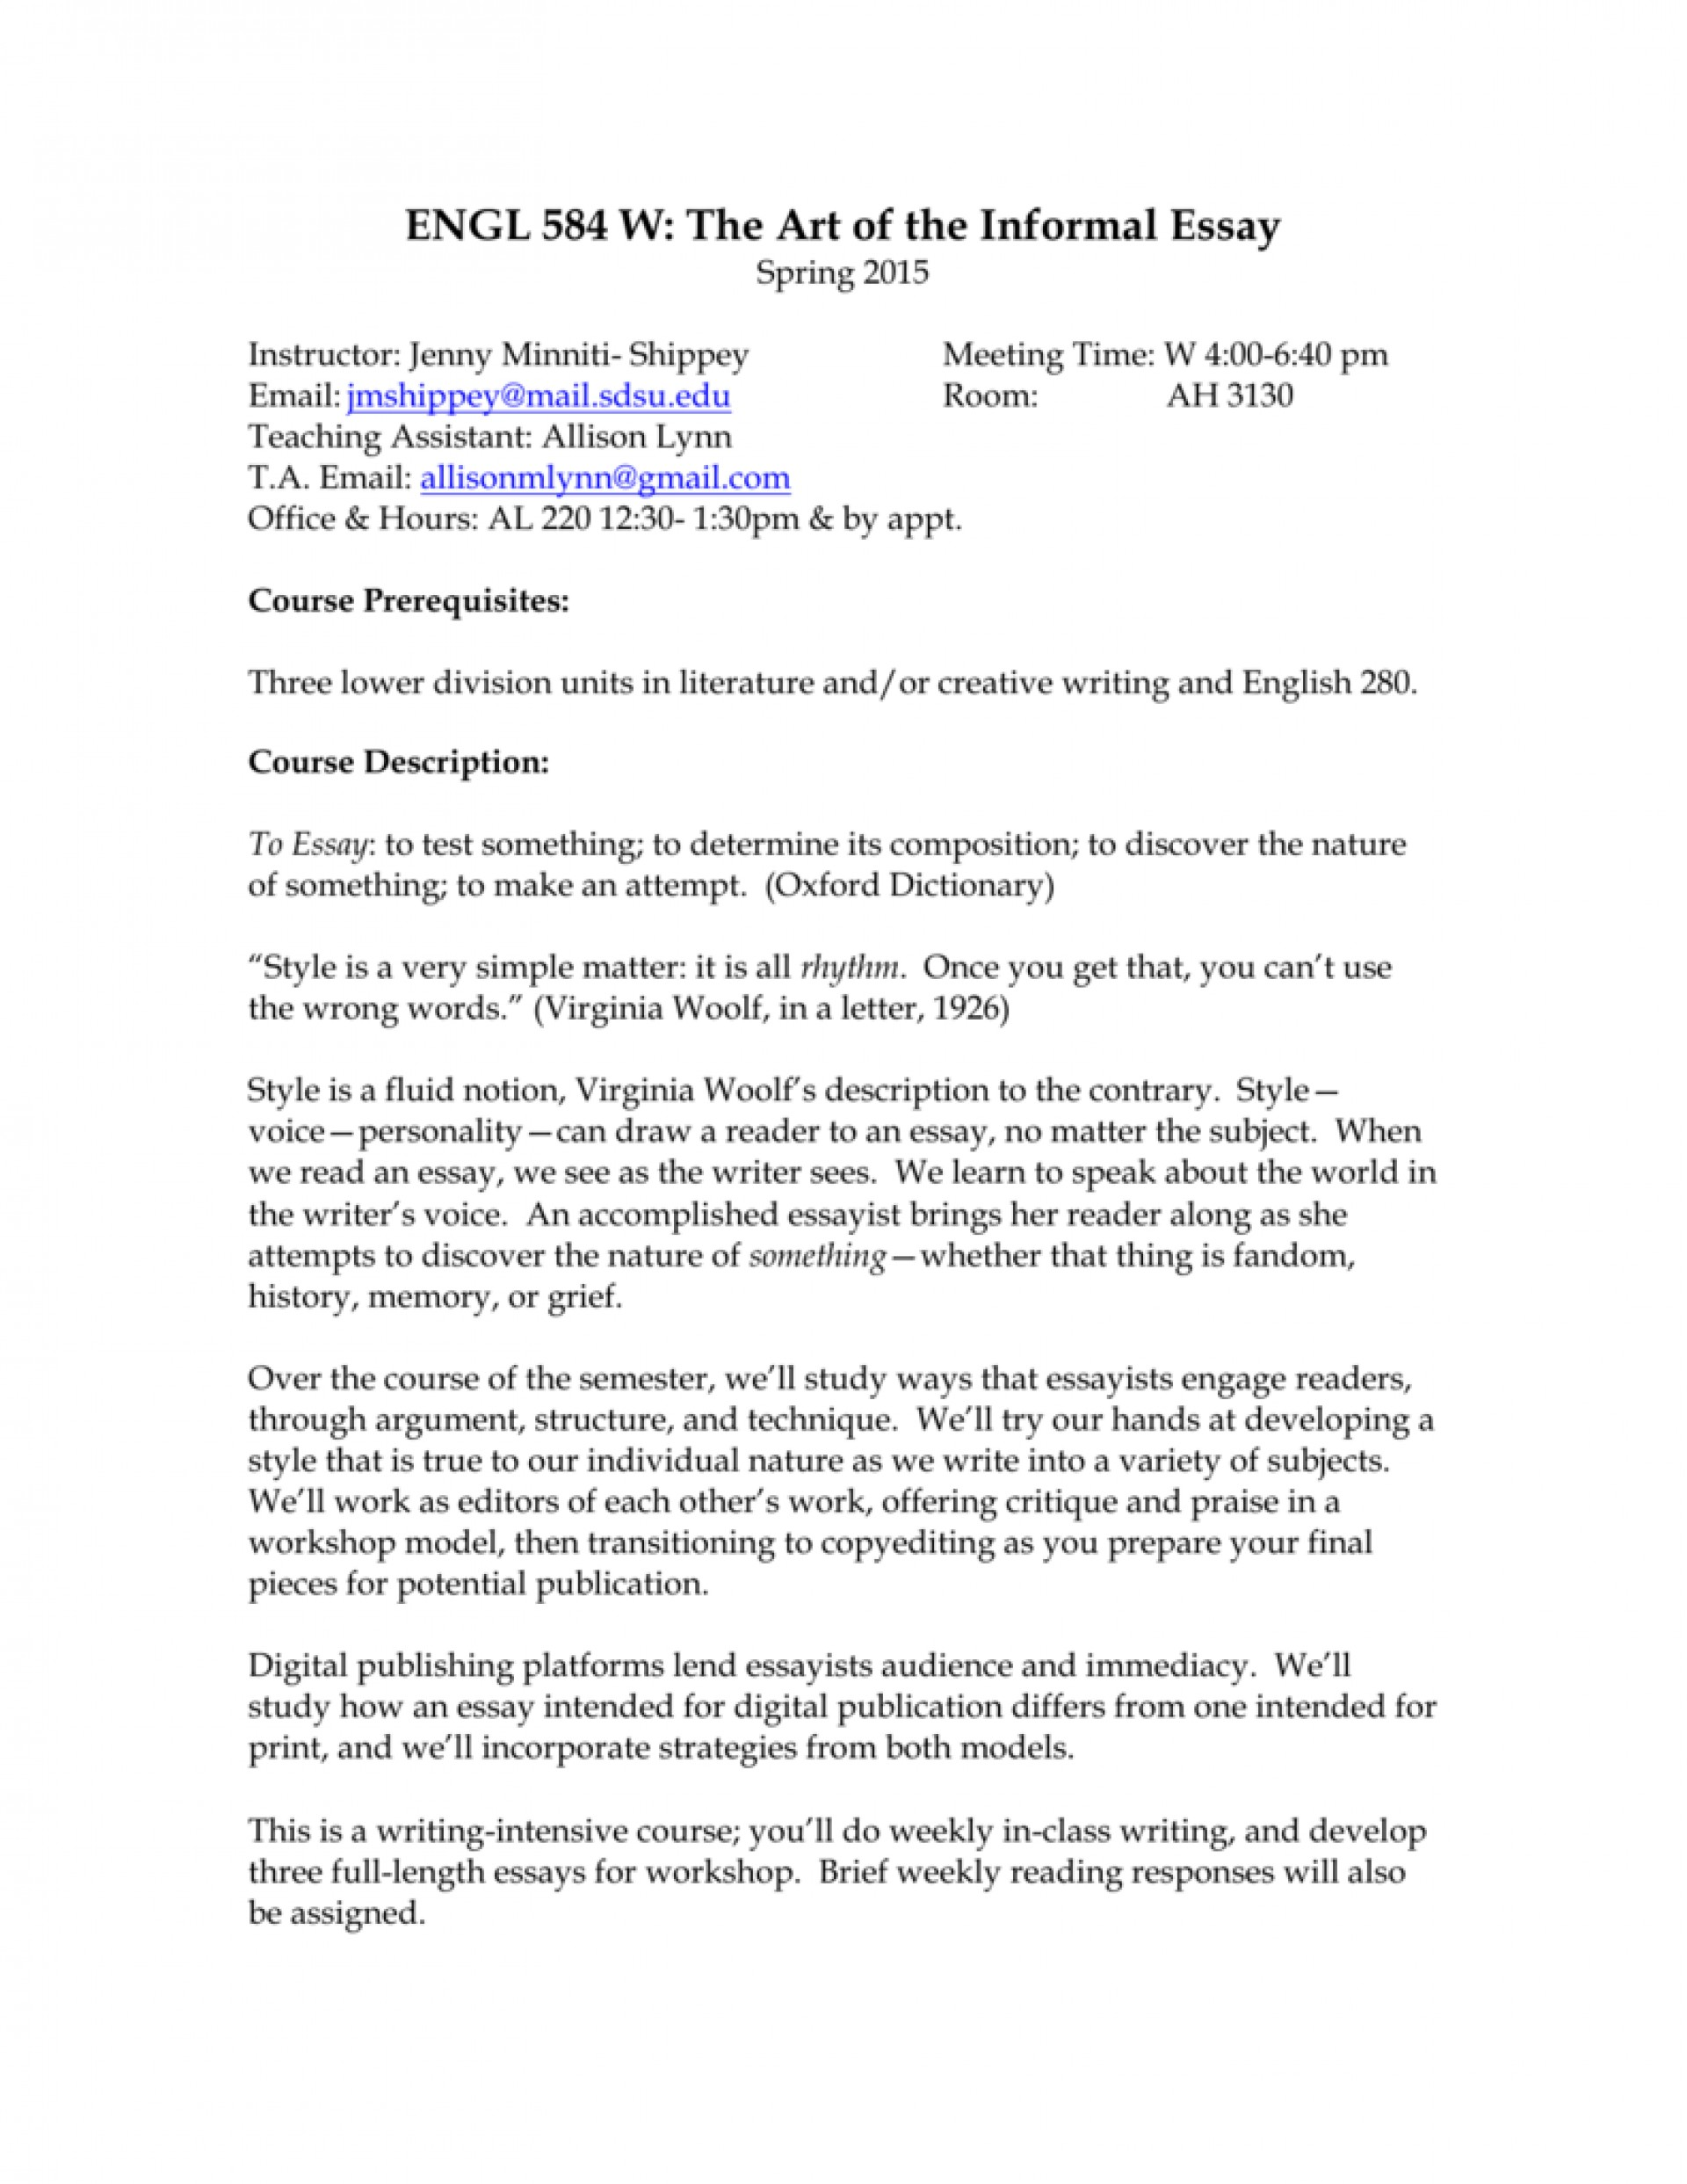 013 Essay Example Virginia Woolf Essays 008036401 1 Unusual Online The Modern Analysis On Self 1920